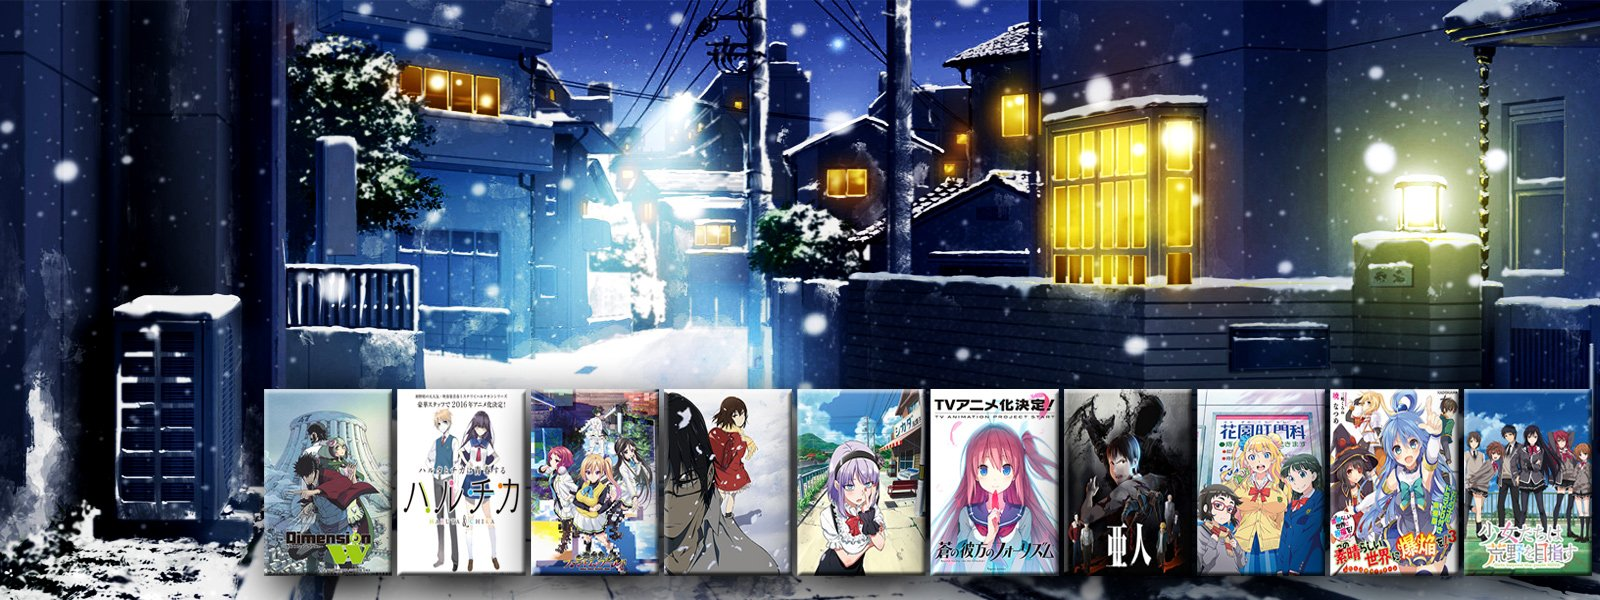 Seriale anime sezonu zima 2016